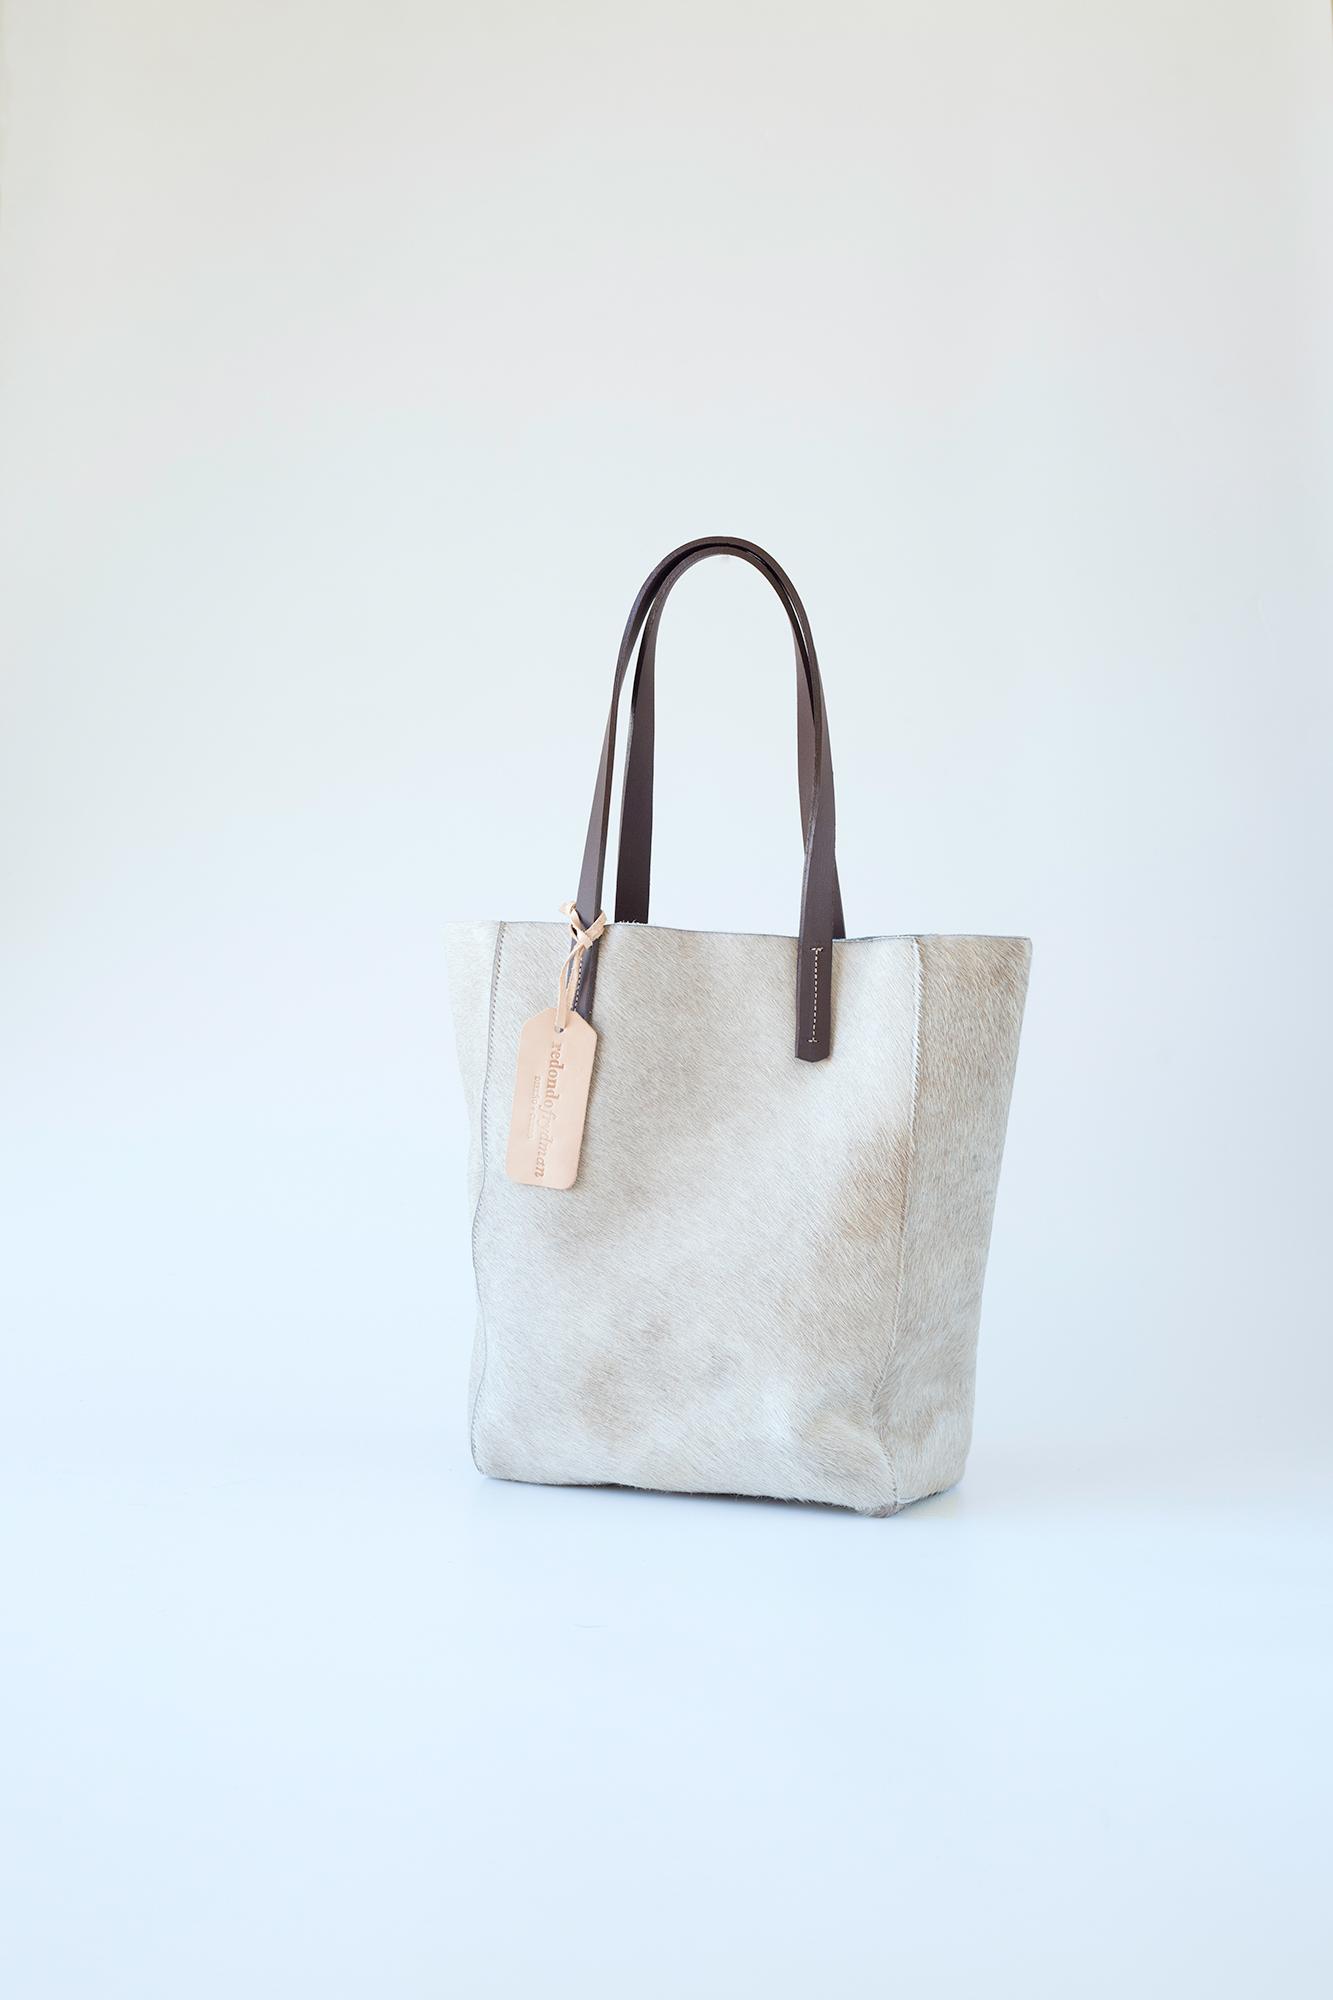 Argentinian leather handbag